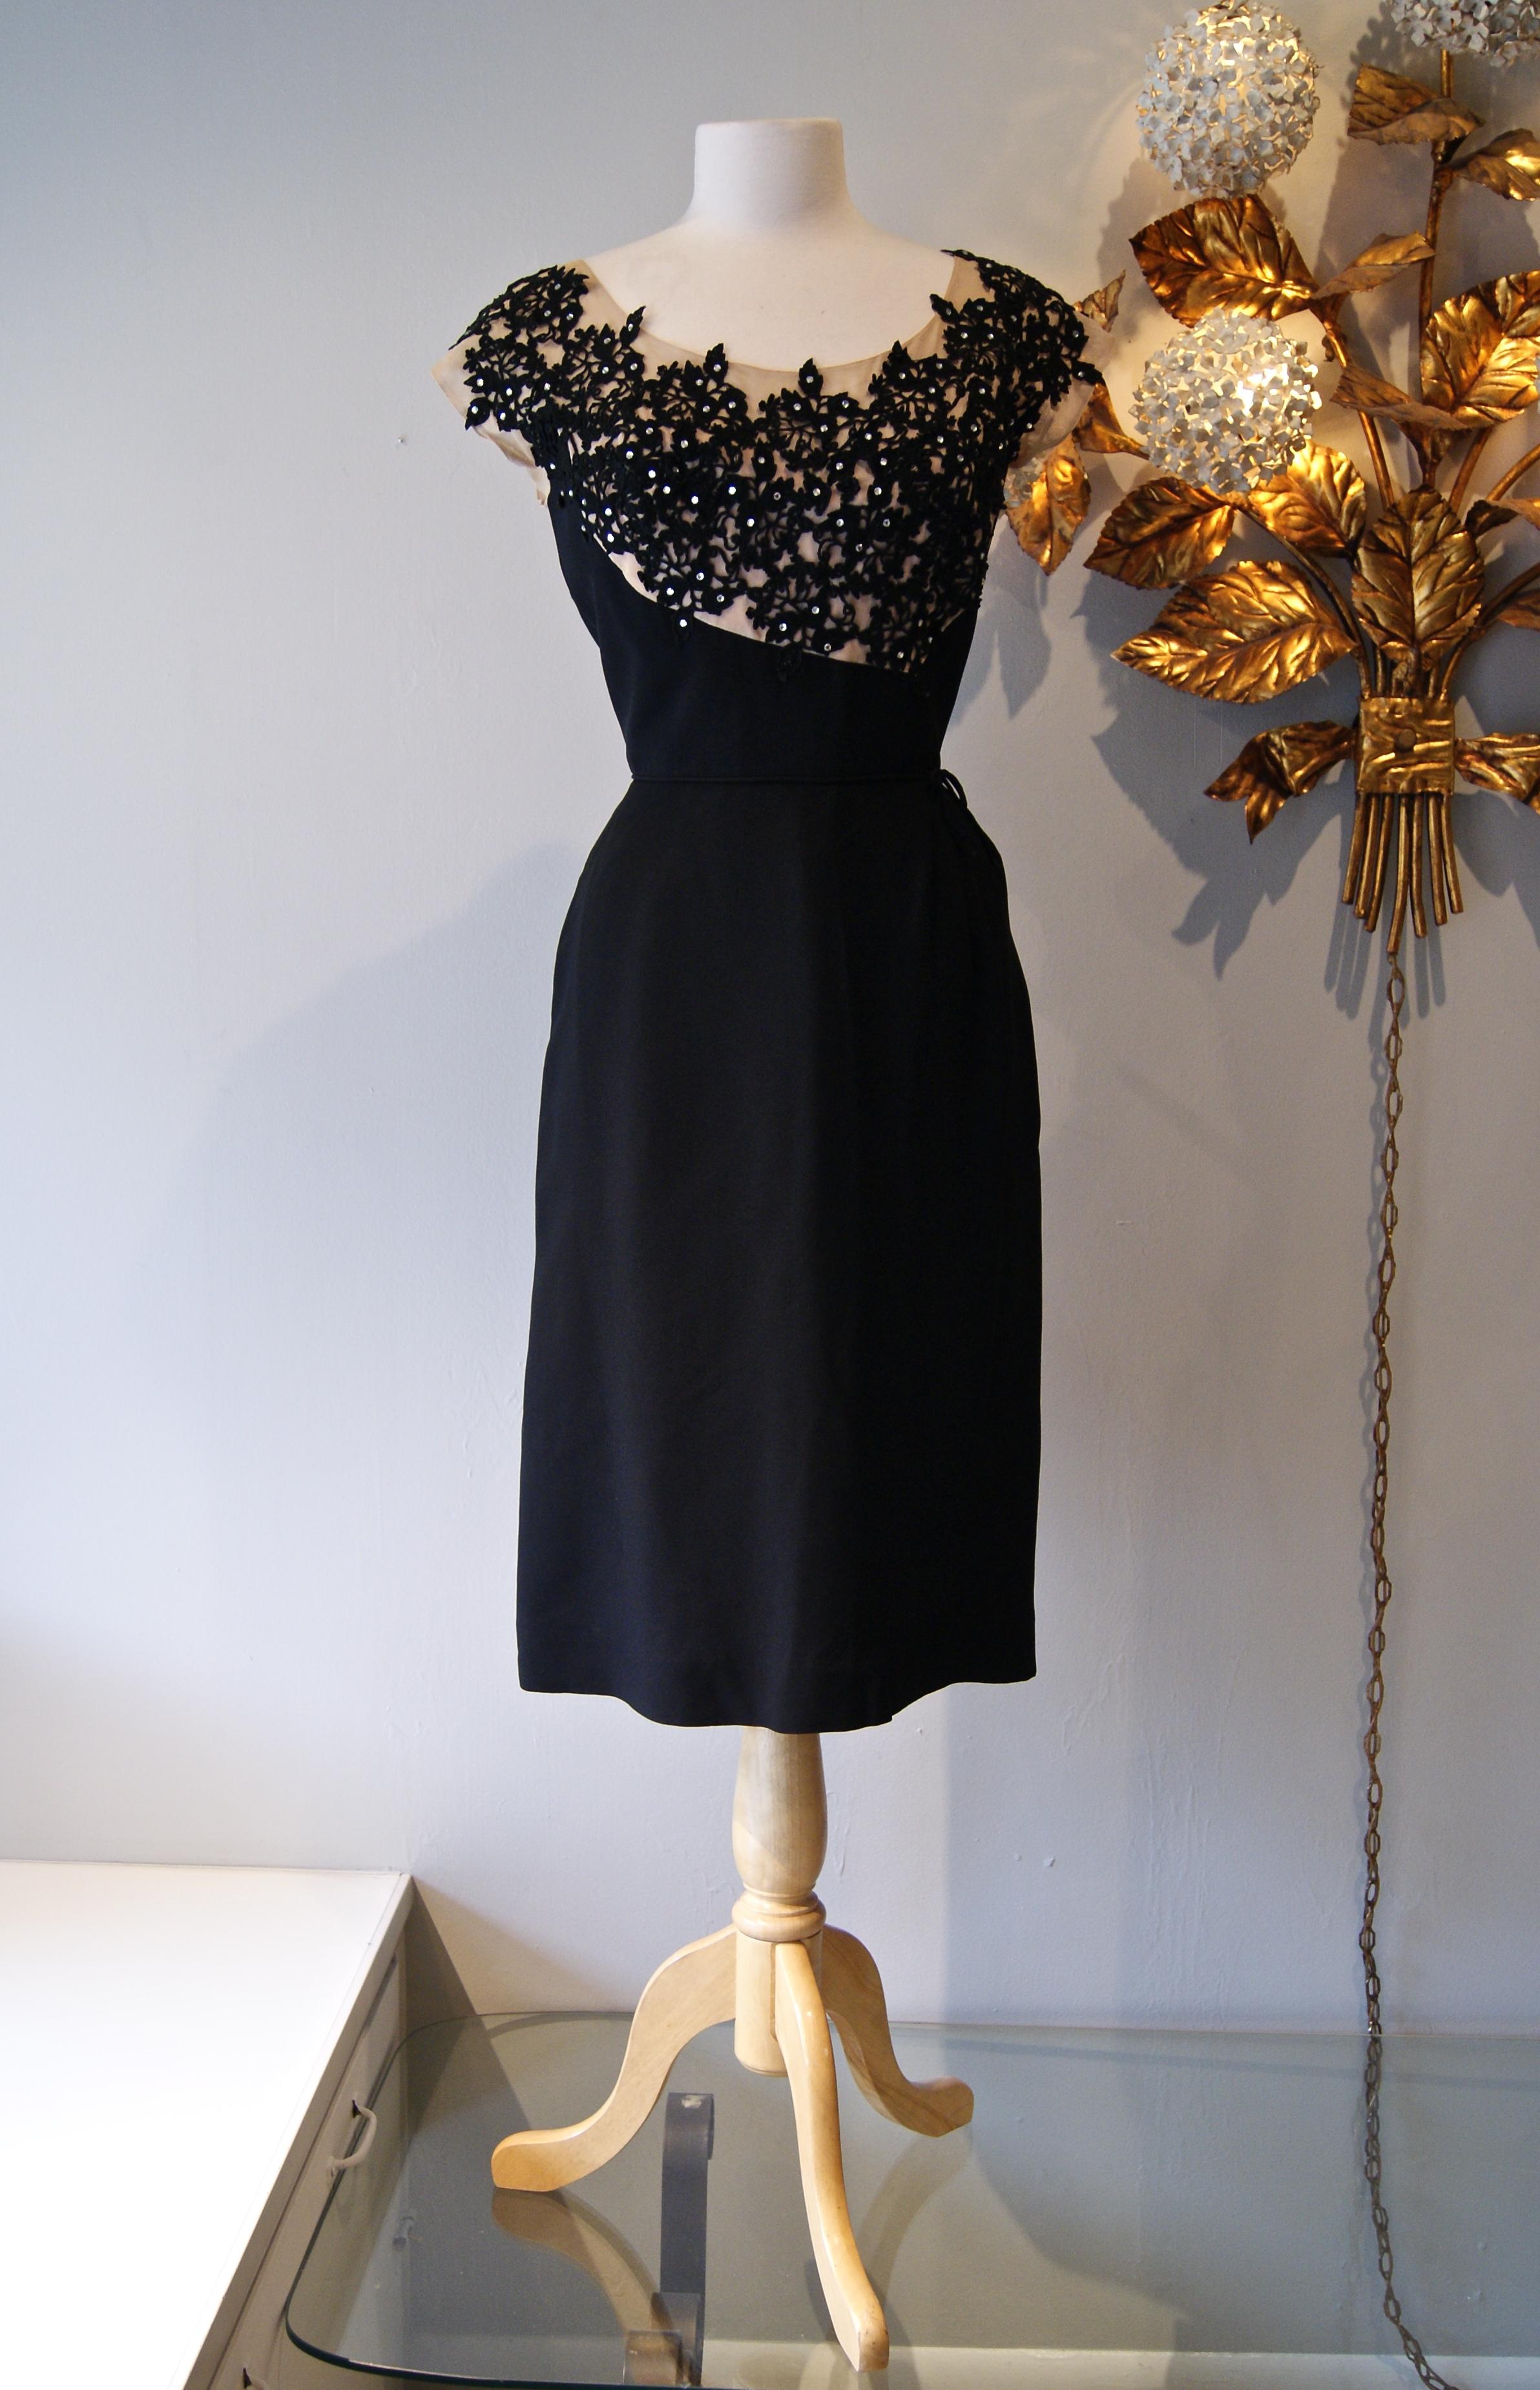 The dress gallery - Dress Gallery